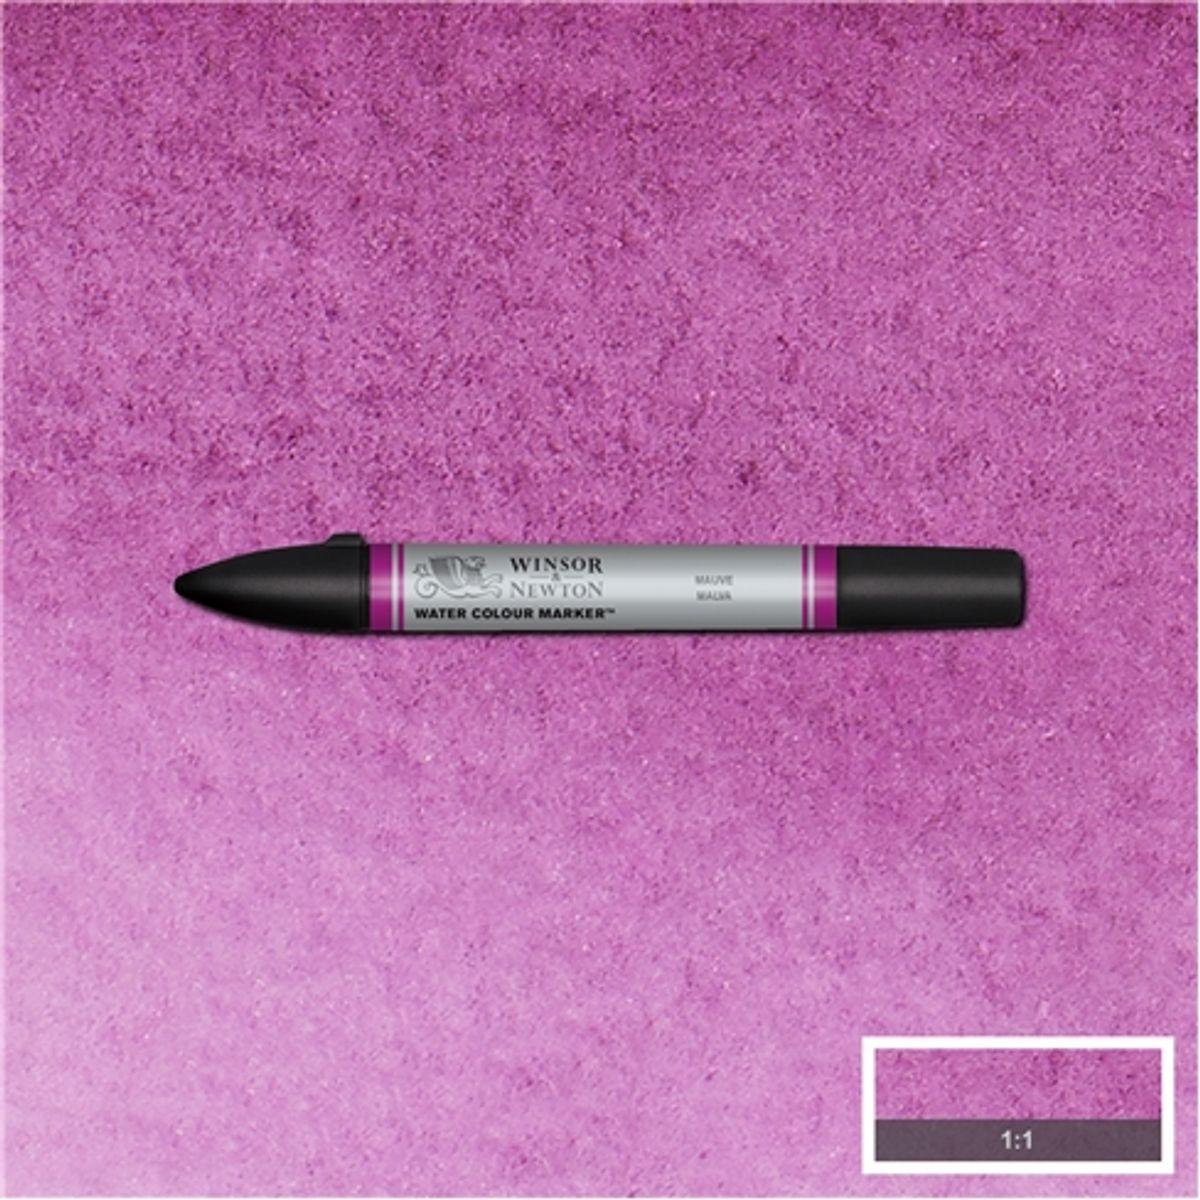 W&N Newton Water Colour Marker Violet.jpg